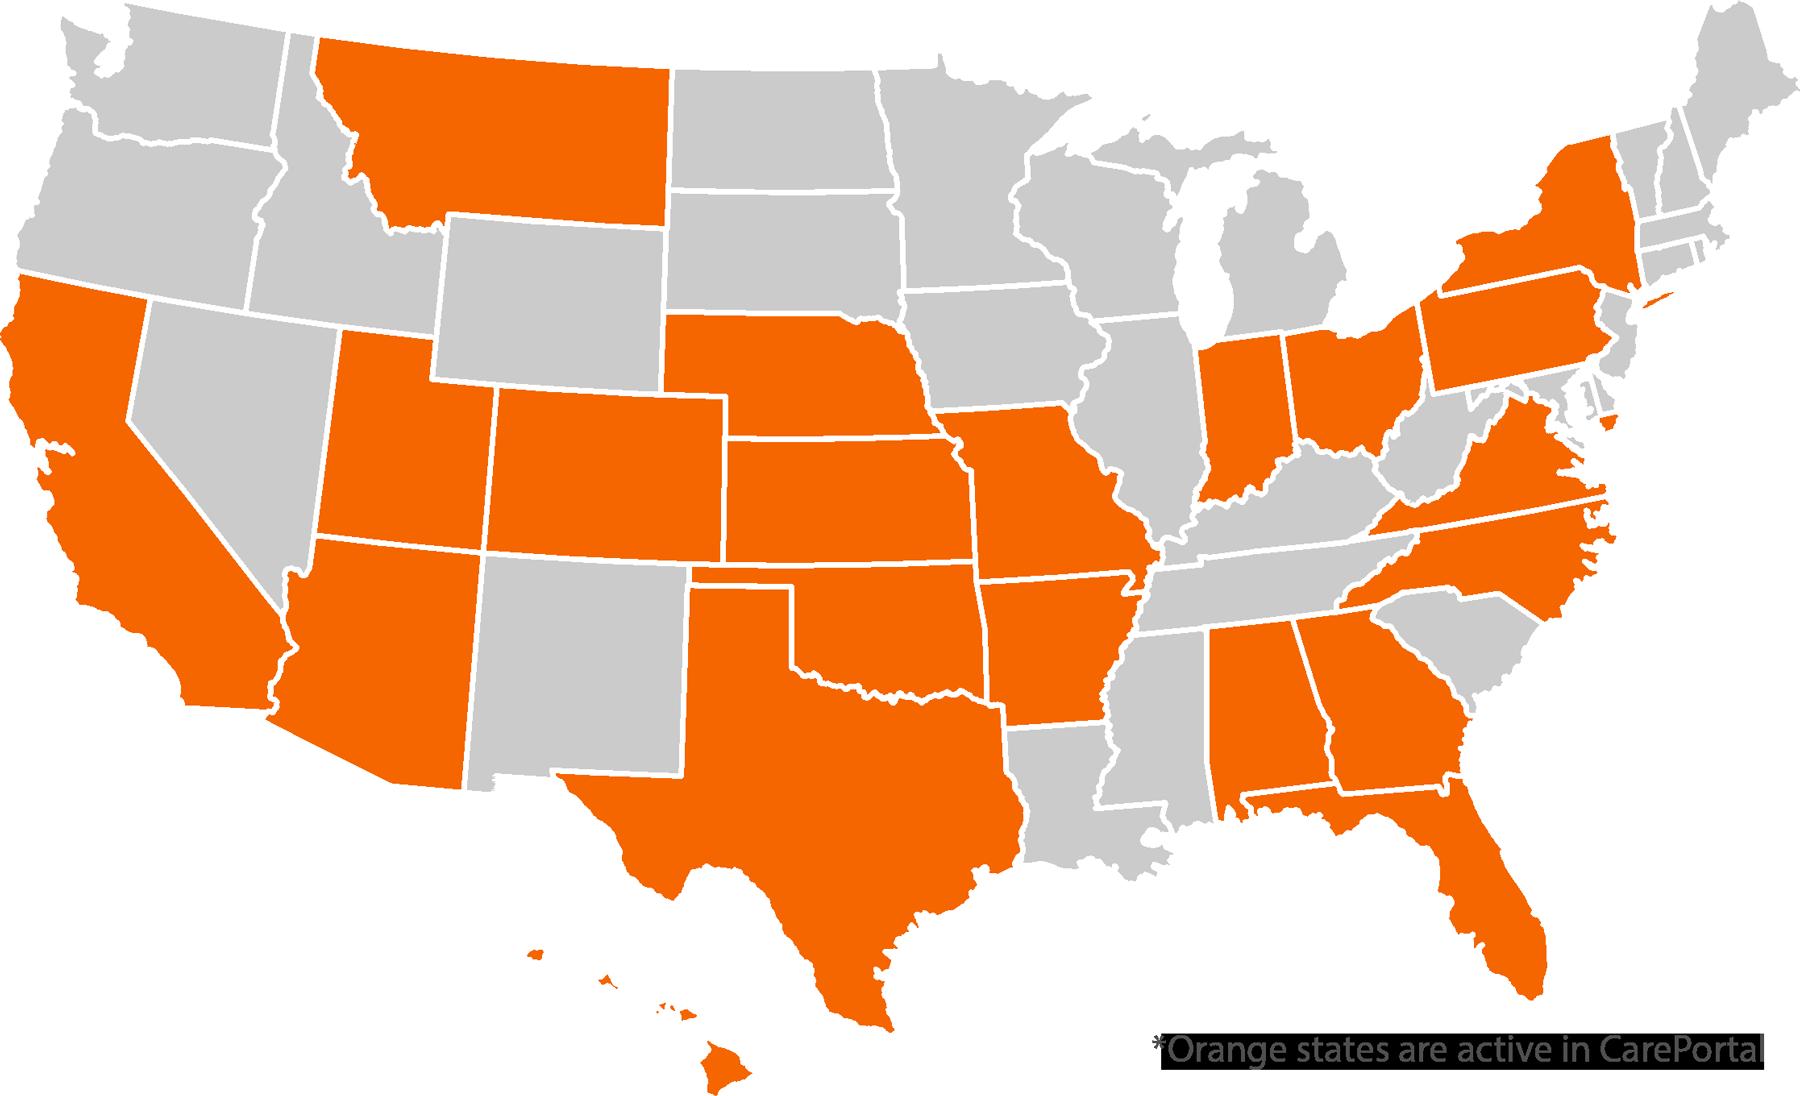 Careportal's Impact Map